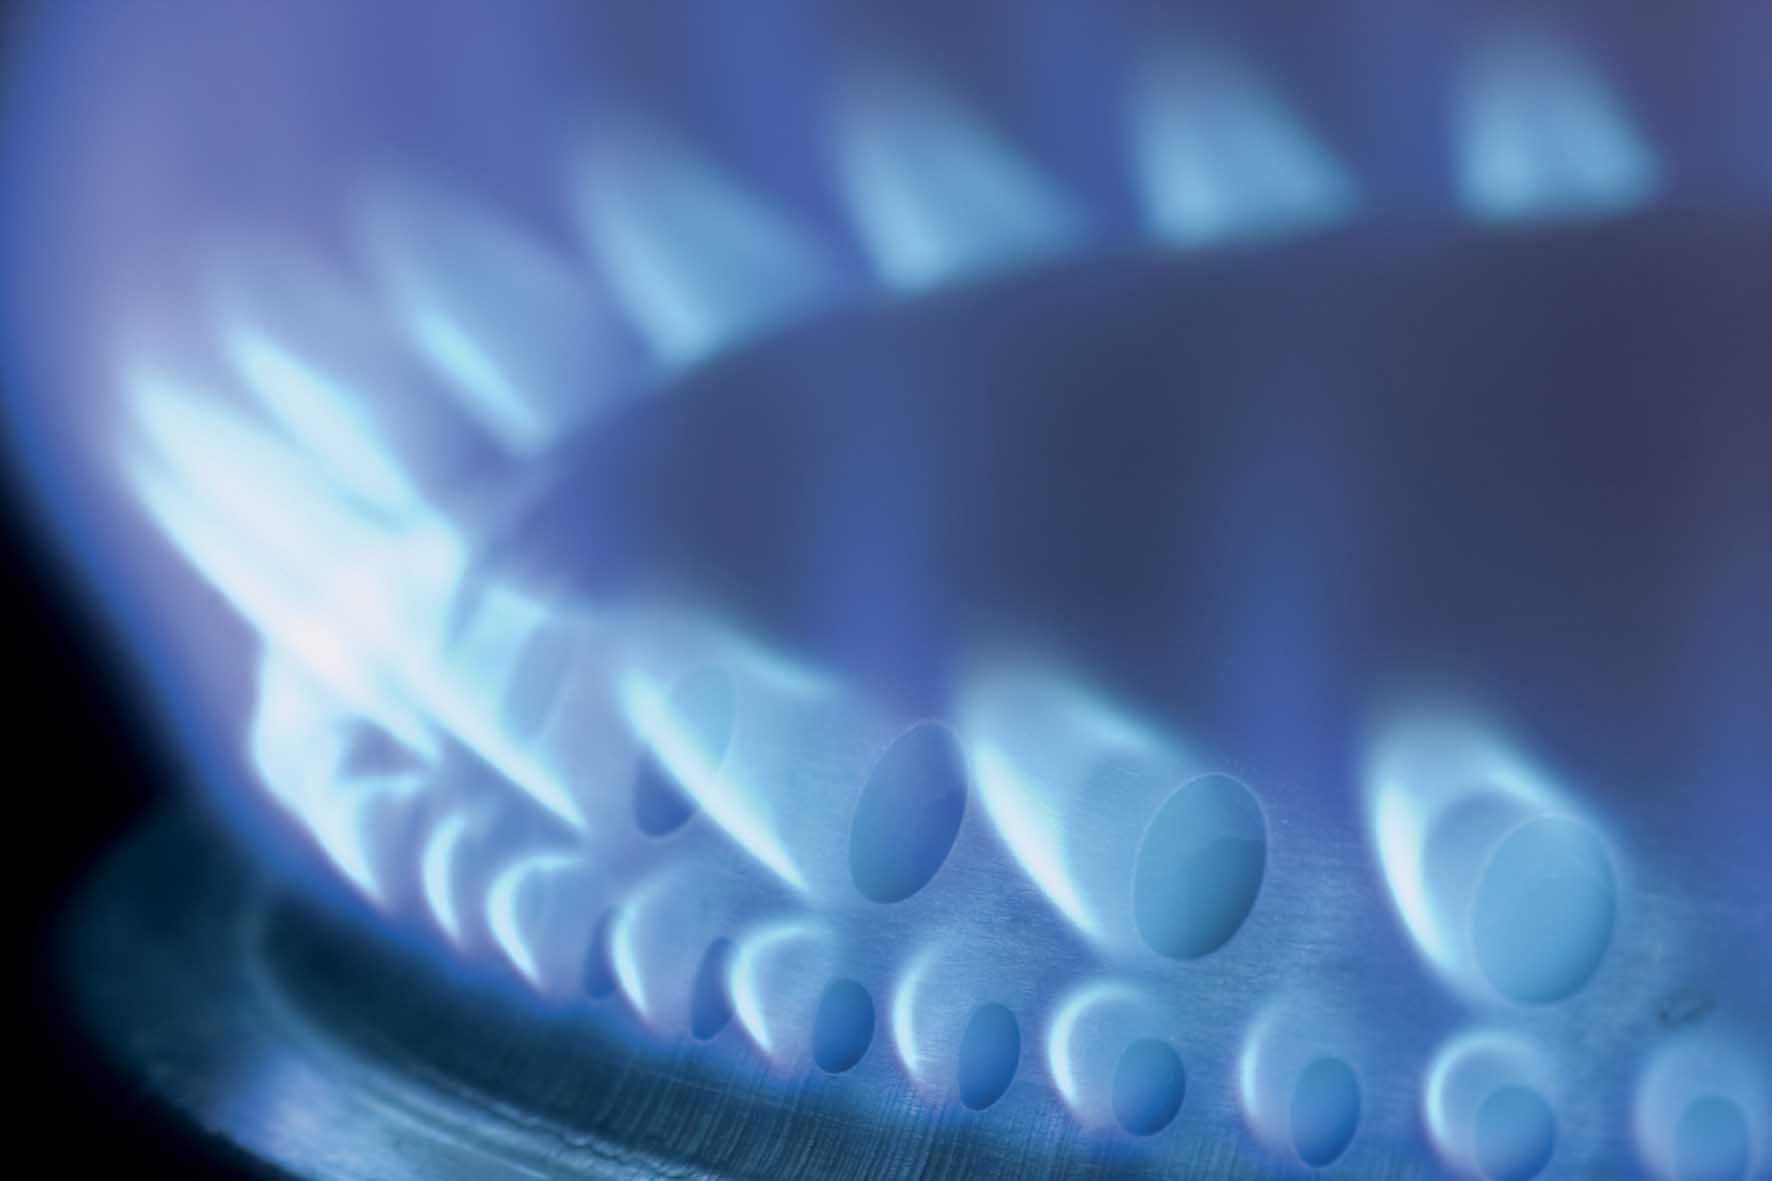 ascopiave multiutility fiamma gas metano bruciatore foto by shutterstock 1